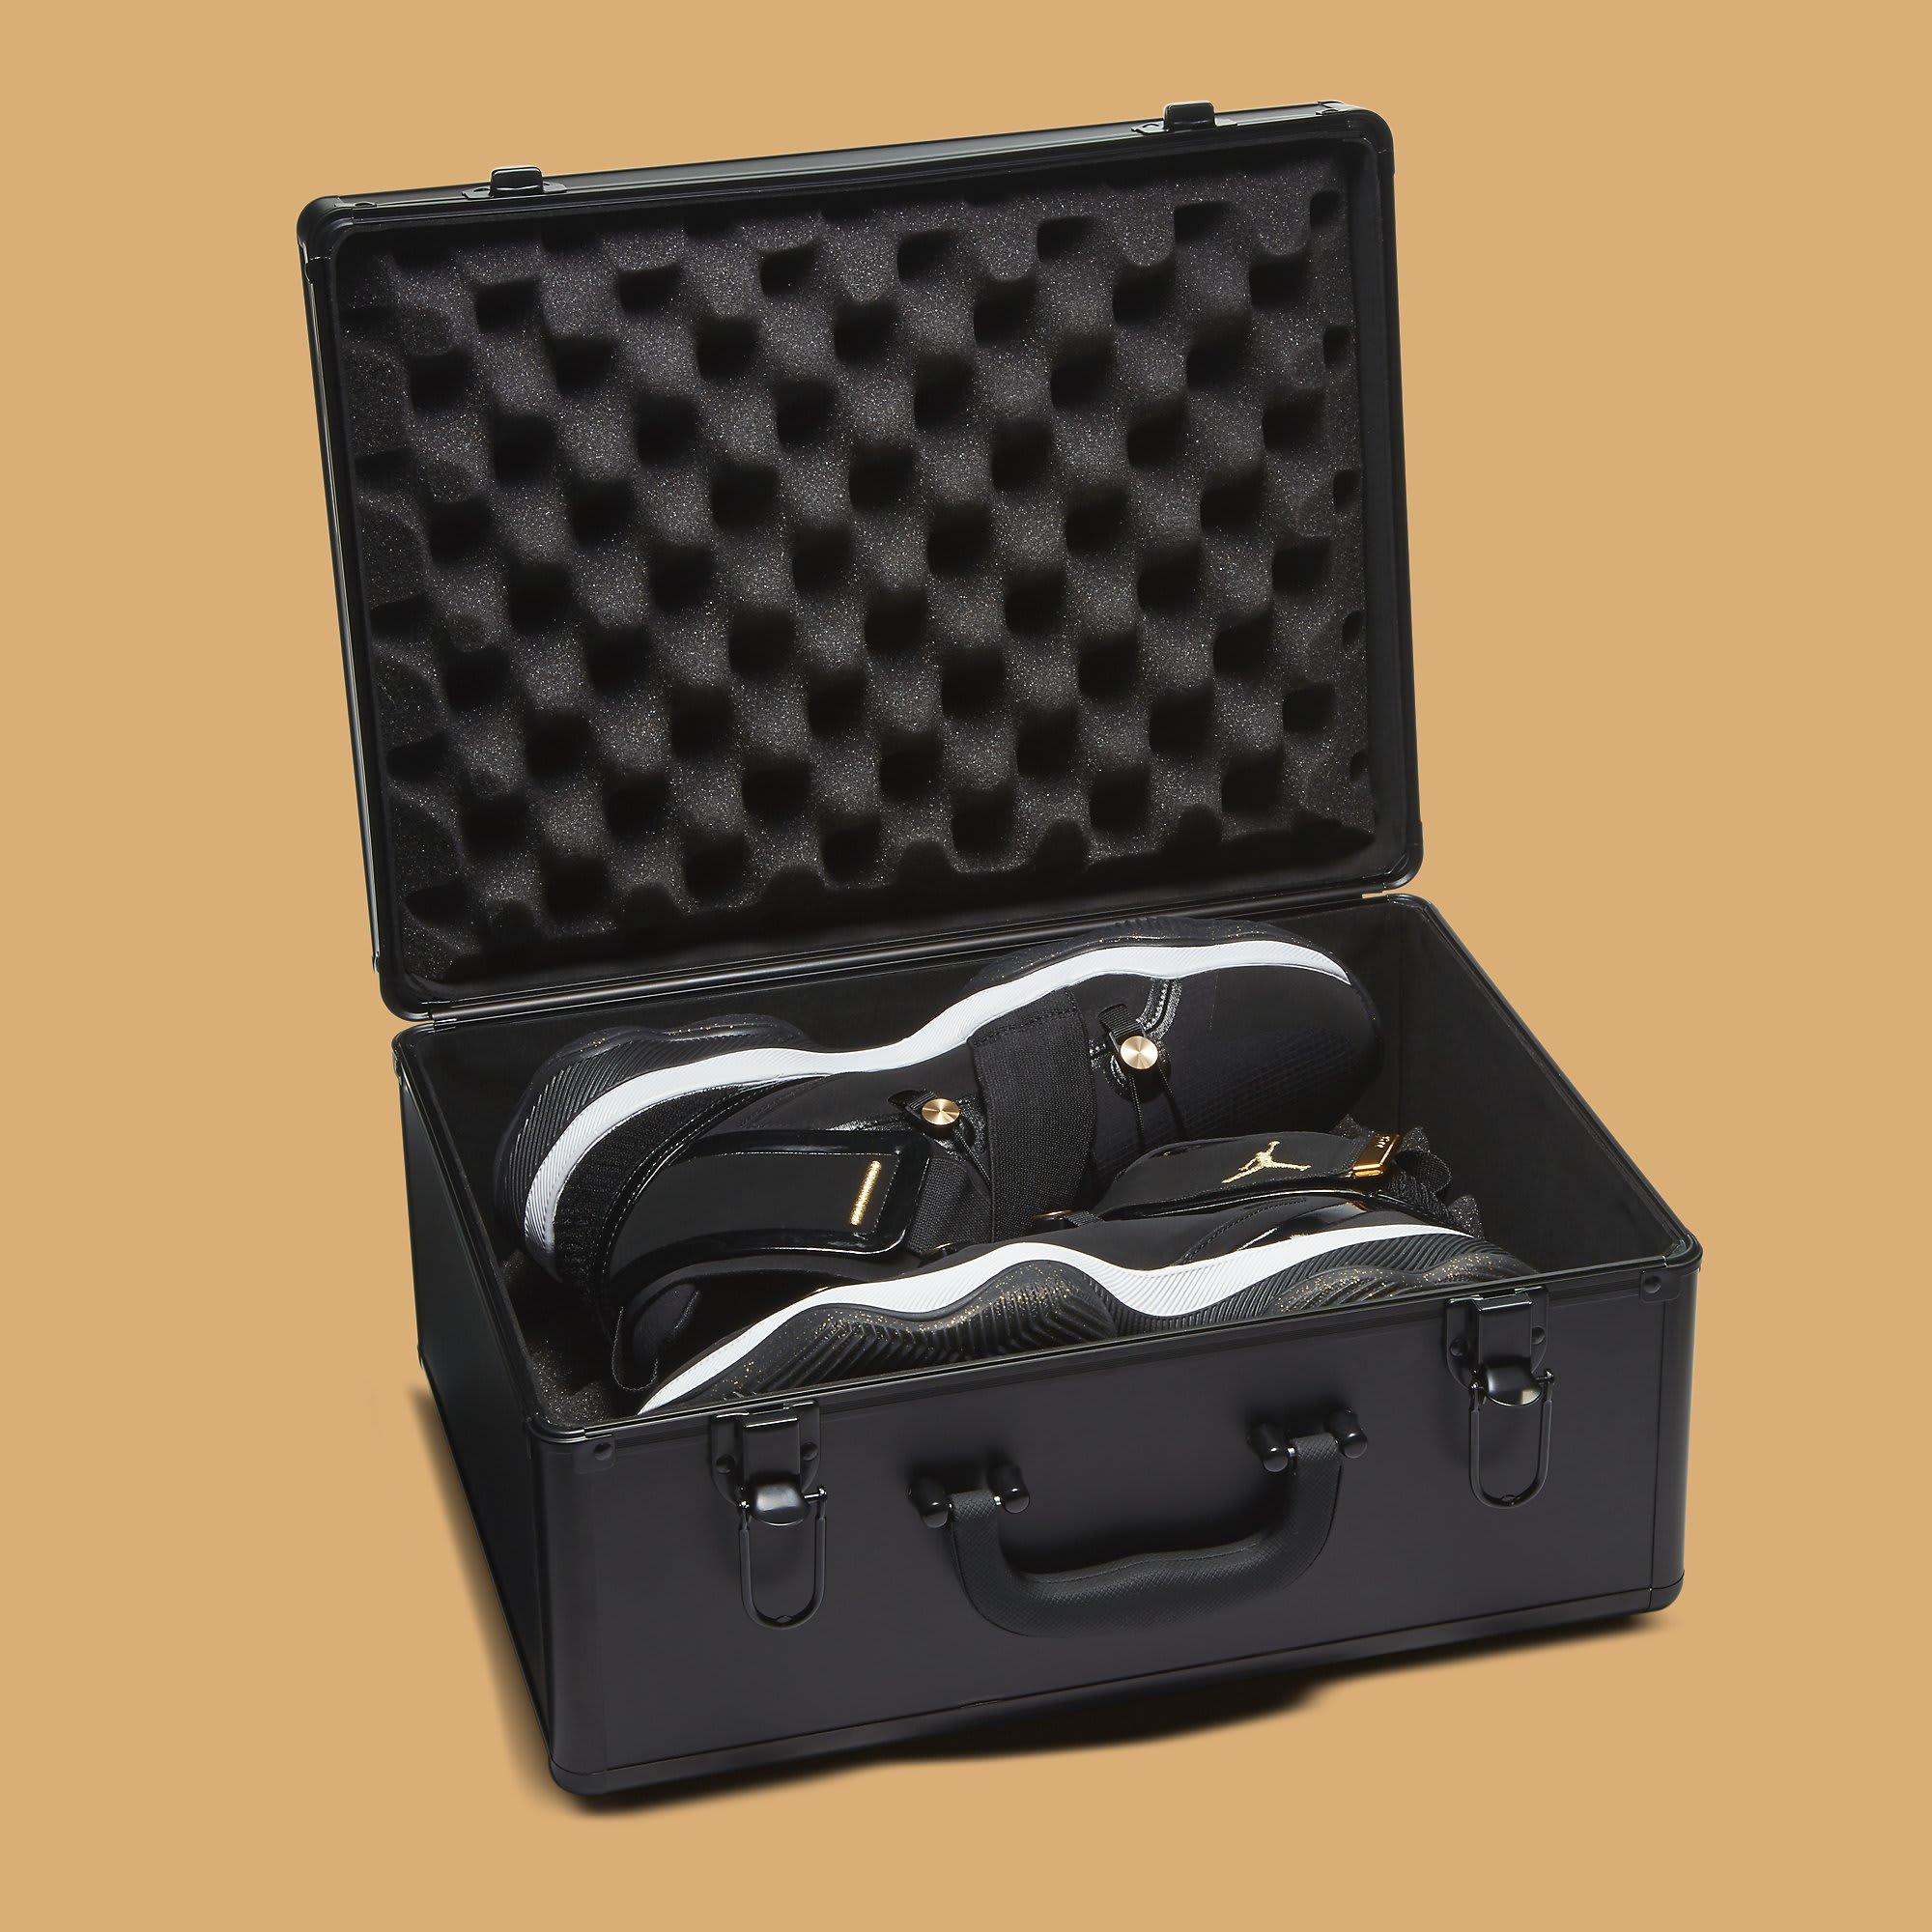 Jordan AJNT 23 Black Gold Release Date CI5441-008 Case Open